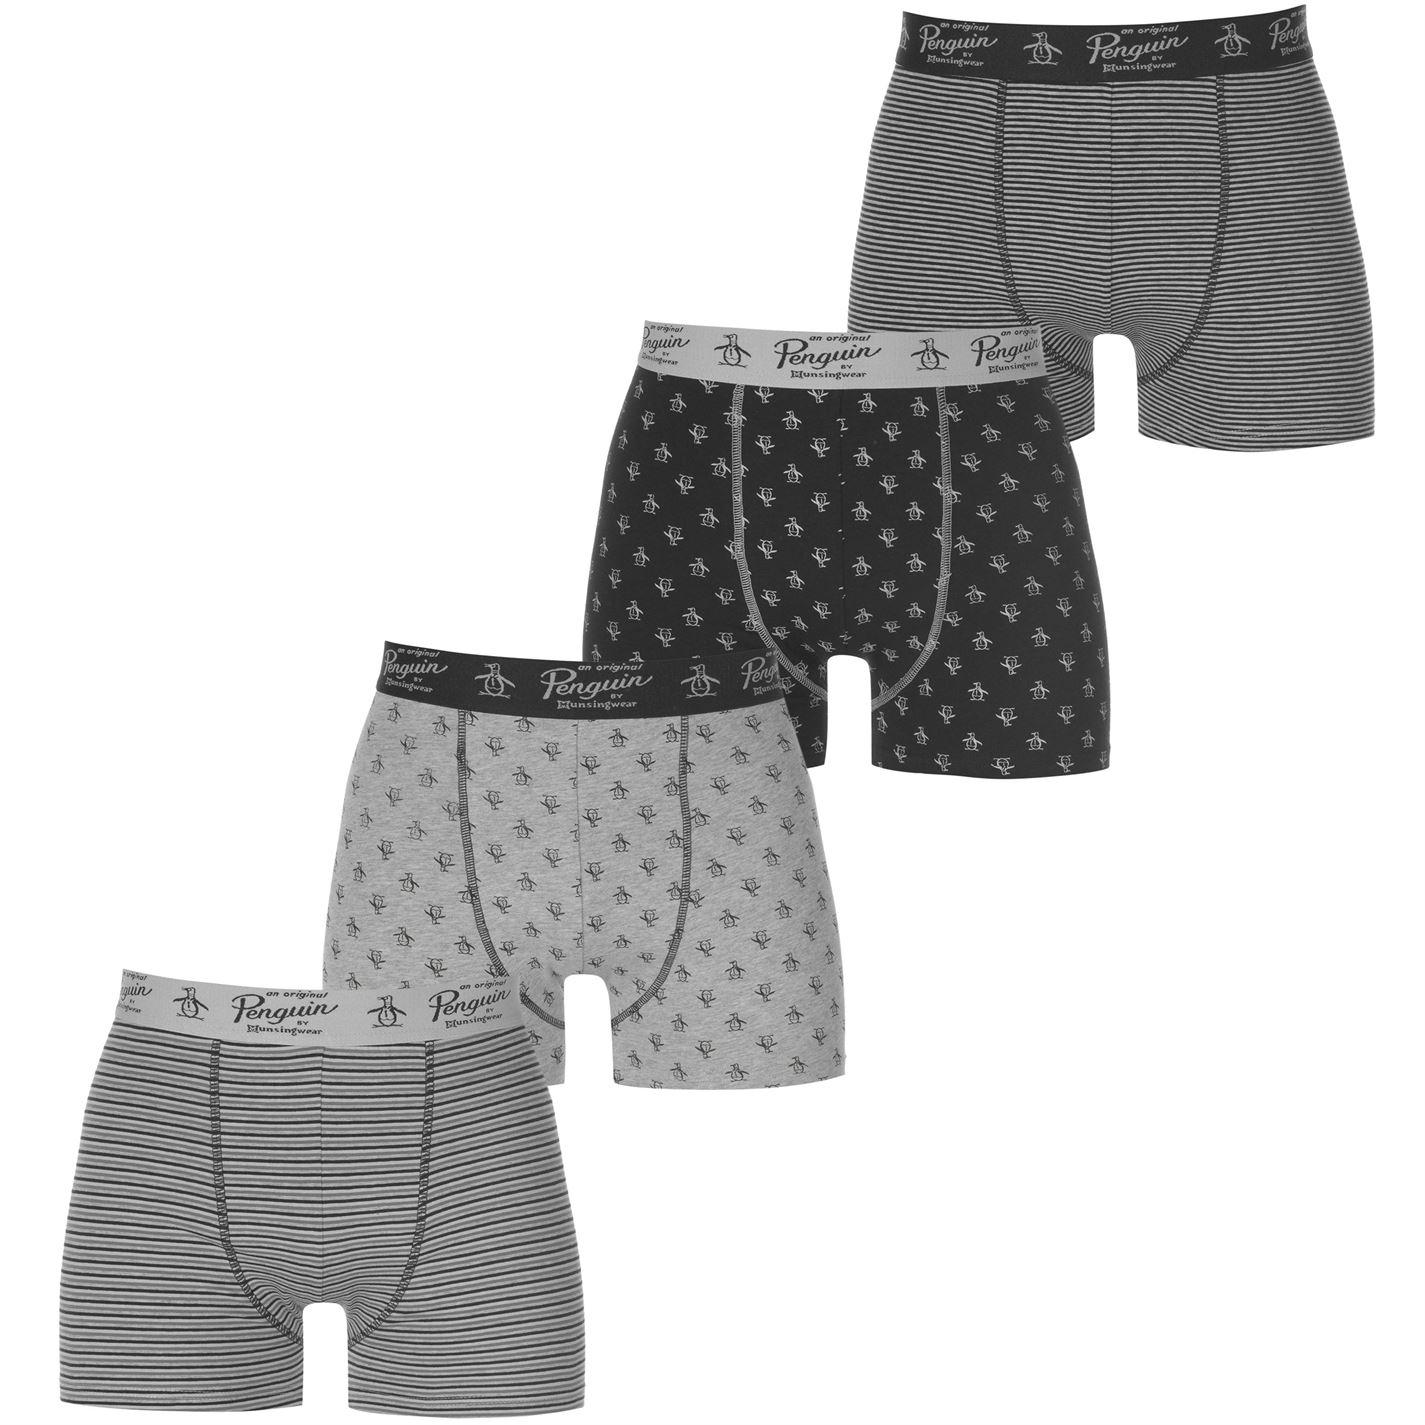 Penguin 4 Pack Boxer Shorts Mens